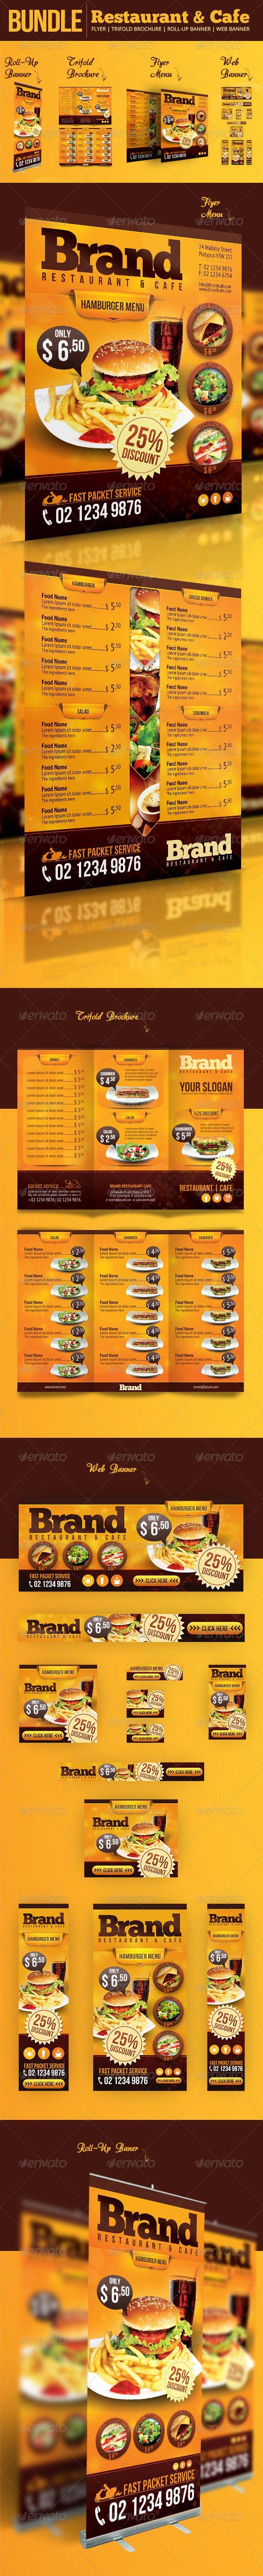 Restaurant & Cafe Bundle Trifold Brochure Restaurant Cafe Menu PSD Template Restaurant Menu Flyer Food Web Banners & Advertise – PSD Templates Restaurant | Cafe Roll Up Banner